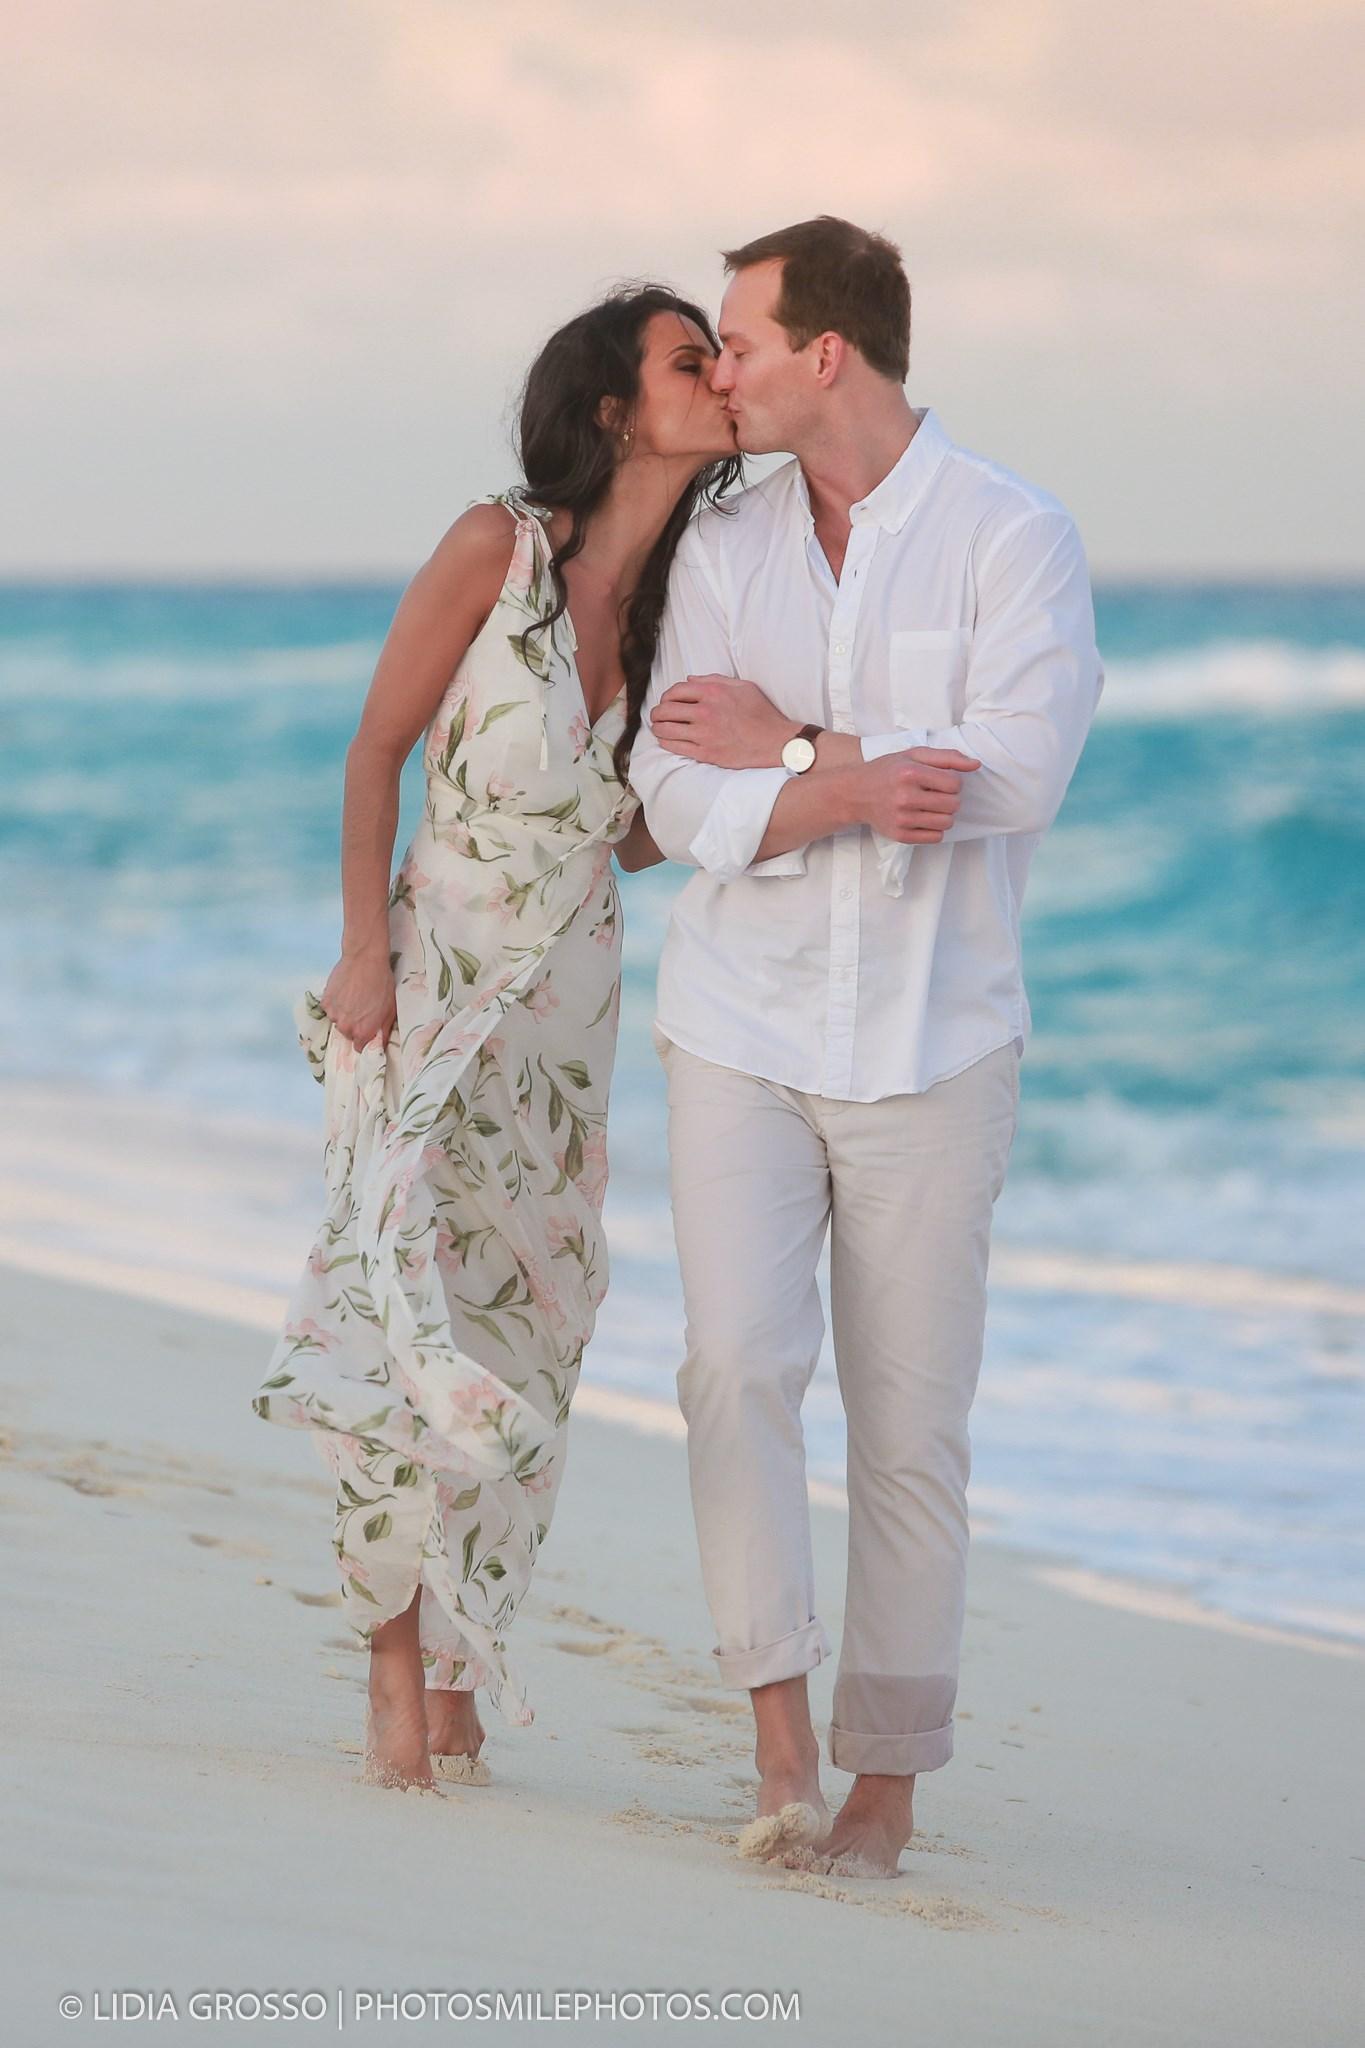 engagement sessions cancun, beach portraits cancun, fotografia coppie torino, fotografo torino, fotografo cancun, beach engagement photos cancun, lidia grosso photography